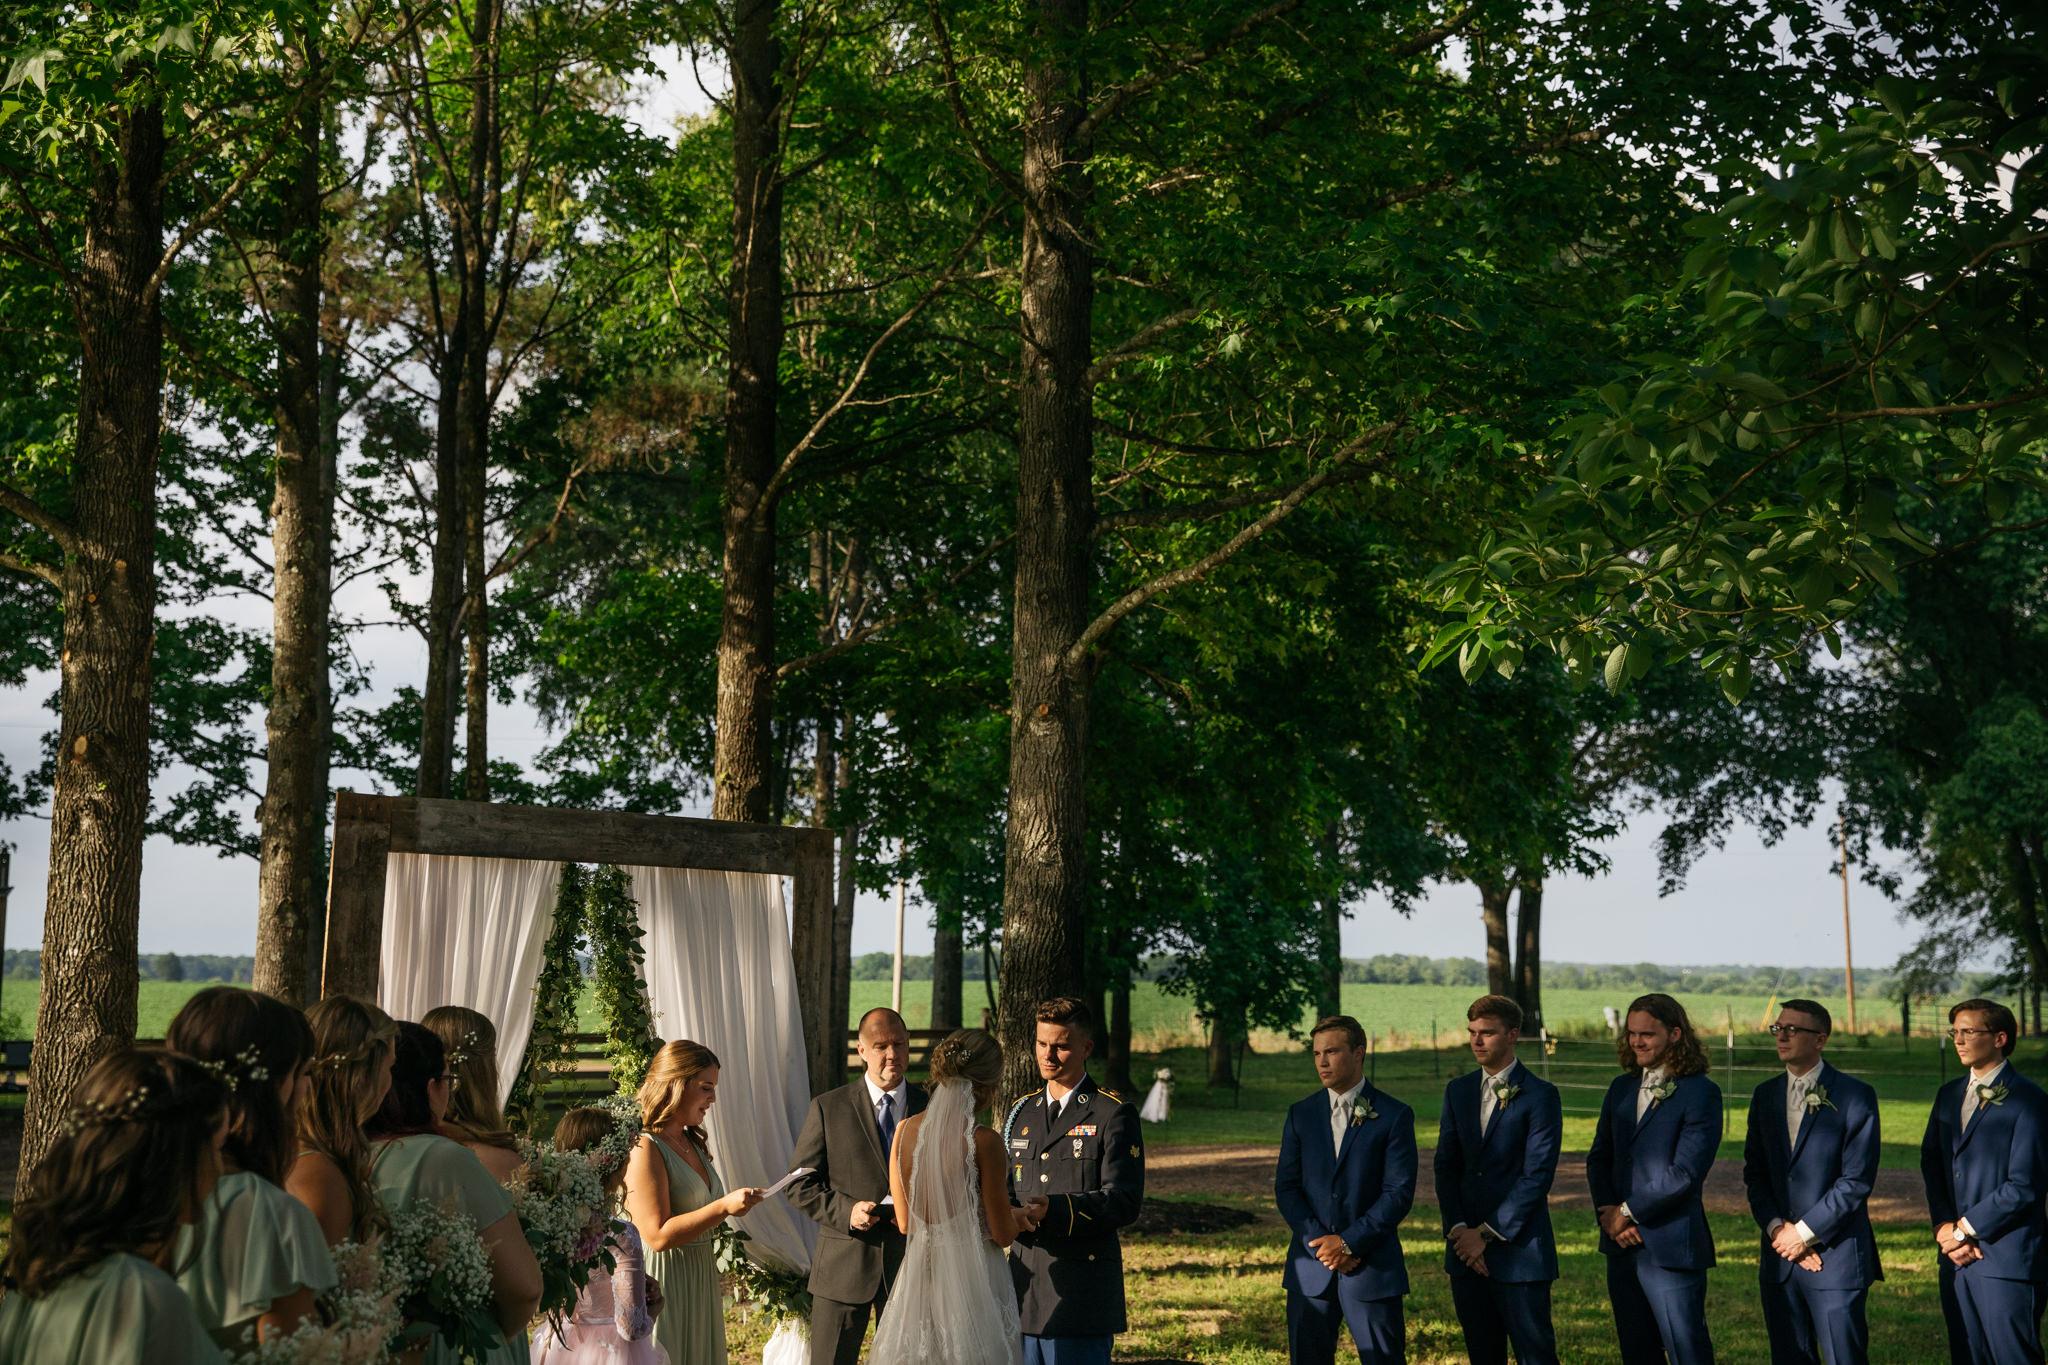 backyard-wedding-thewarmtharoundyou-lexy-branson-53.jpg